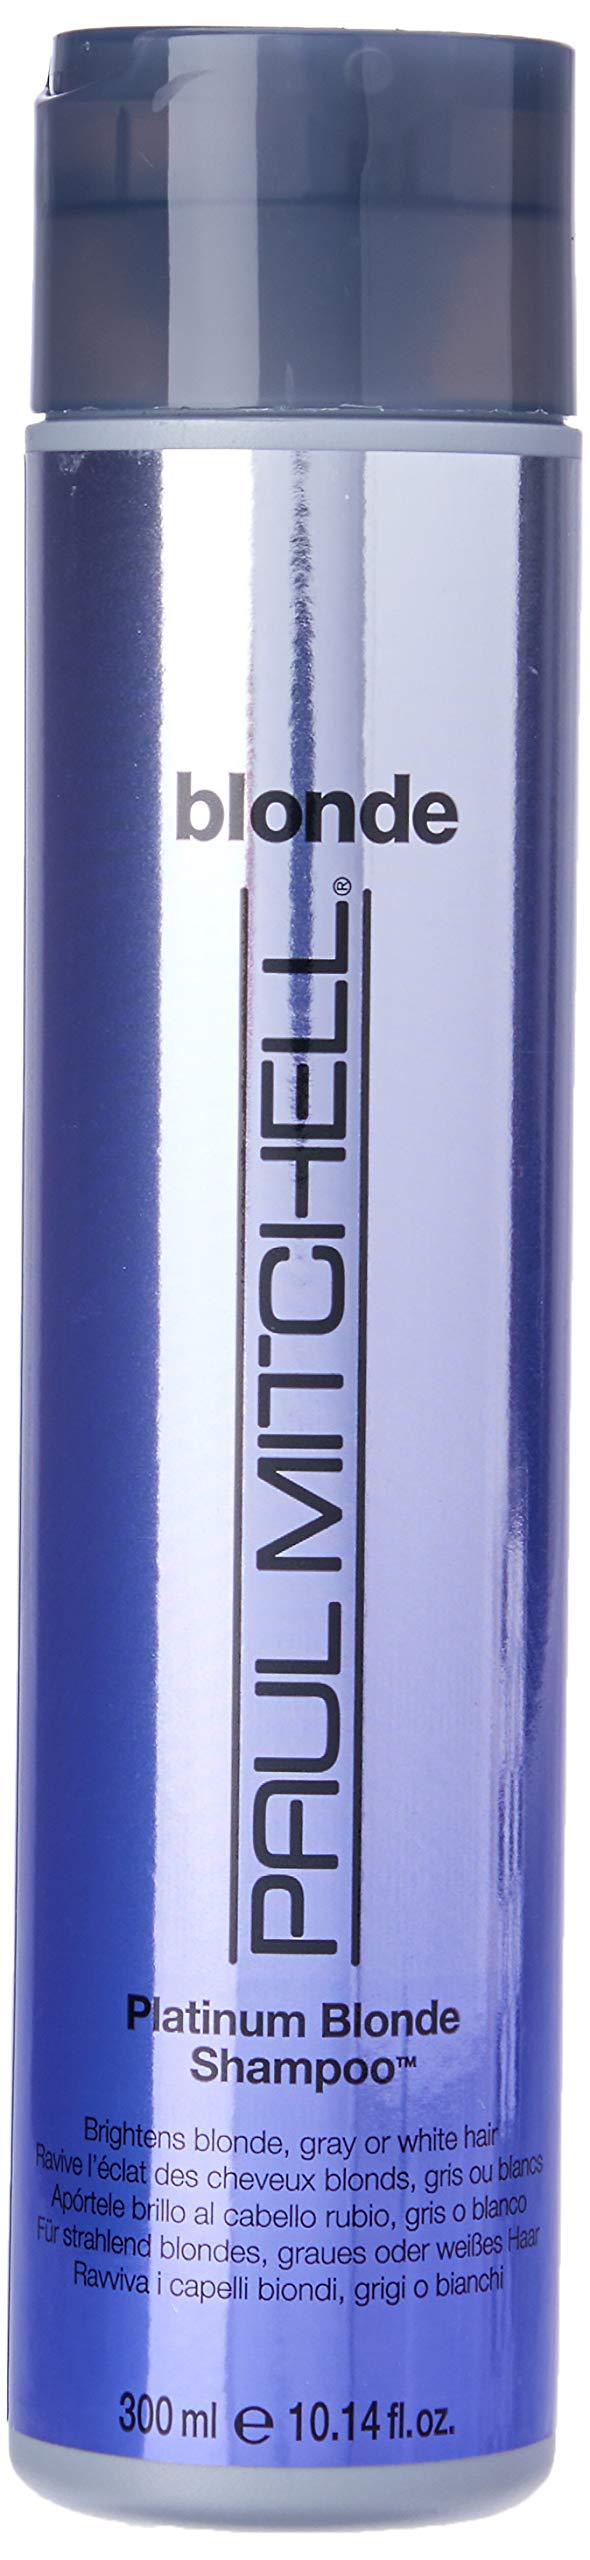 Paul Mitchell Platinum Blonde Shampoo, 10.14 Ounce by Paul Mitchell